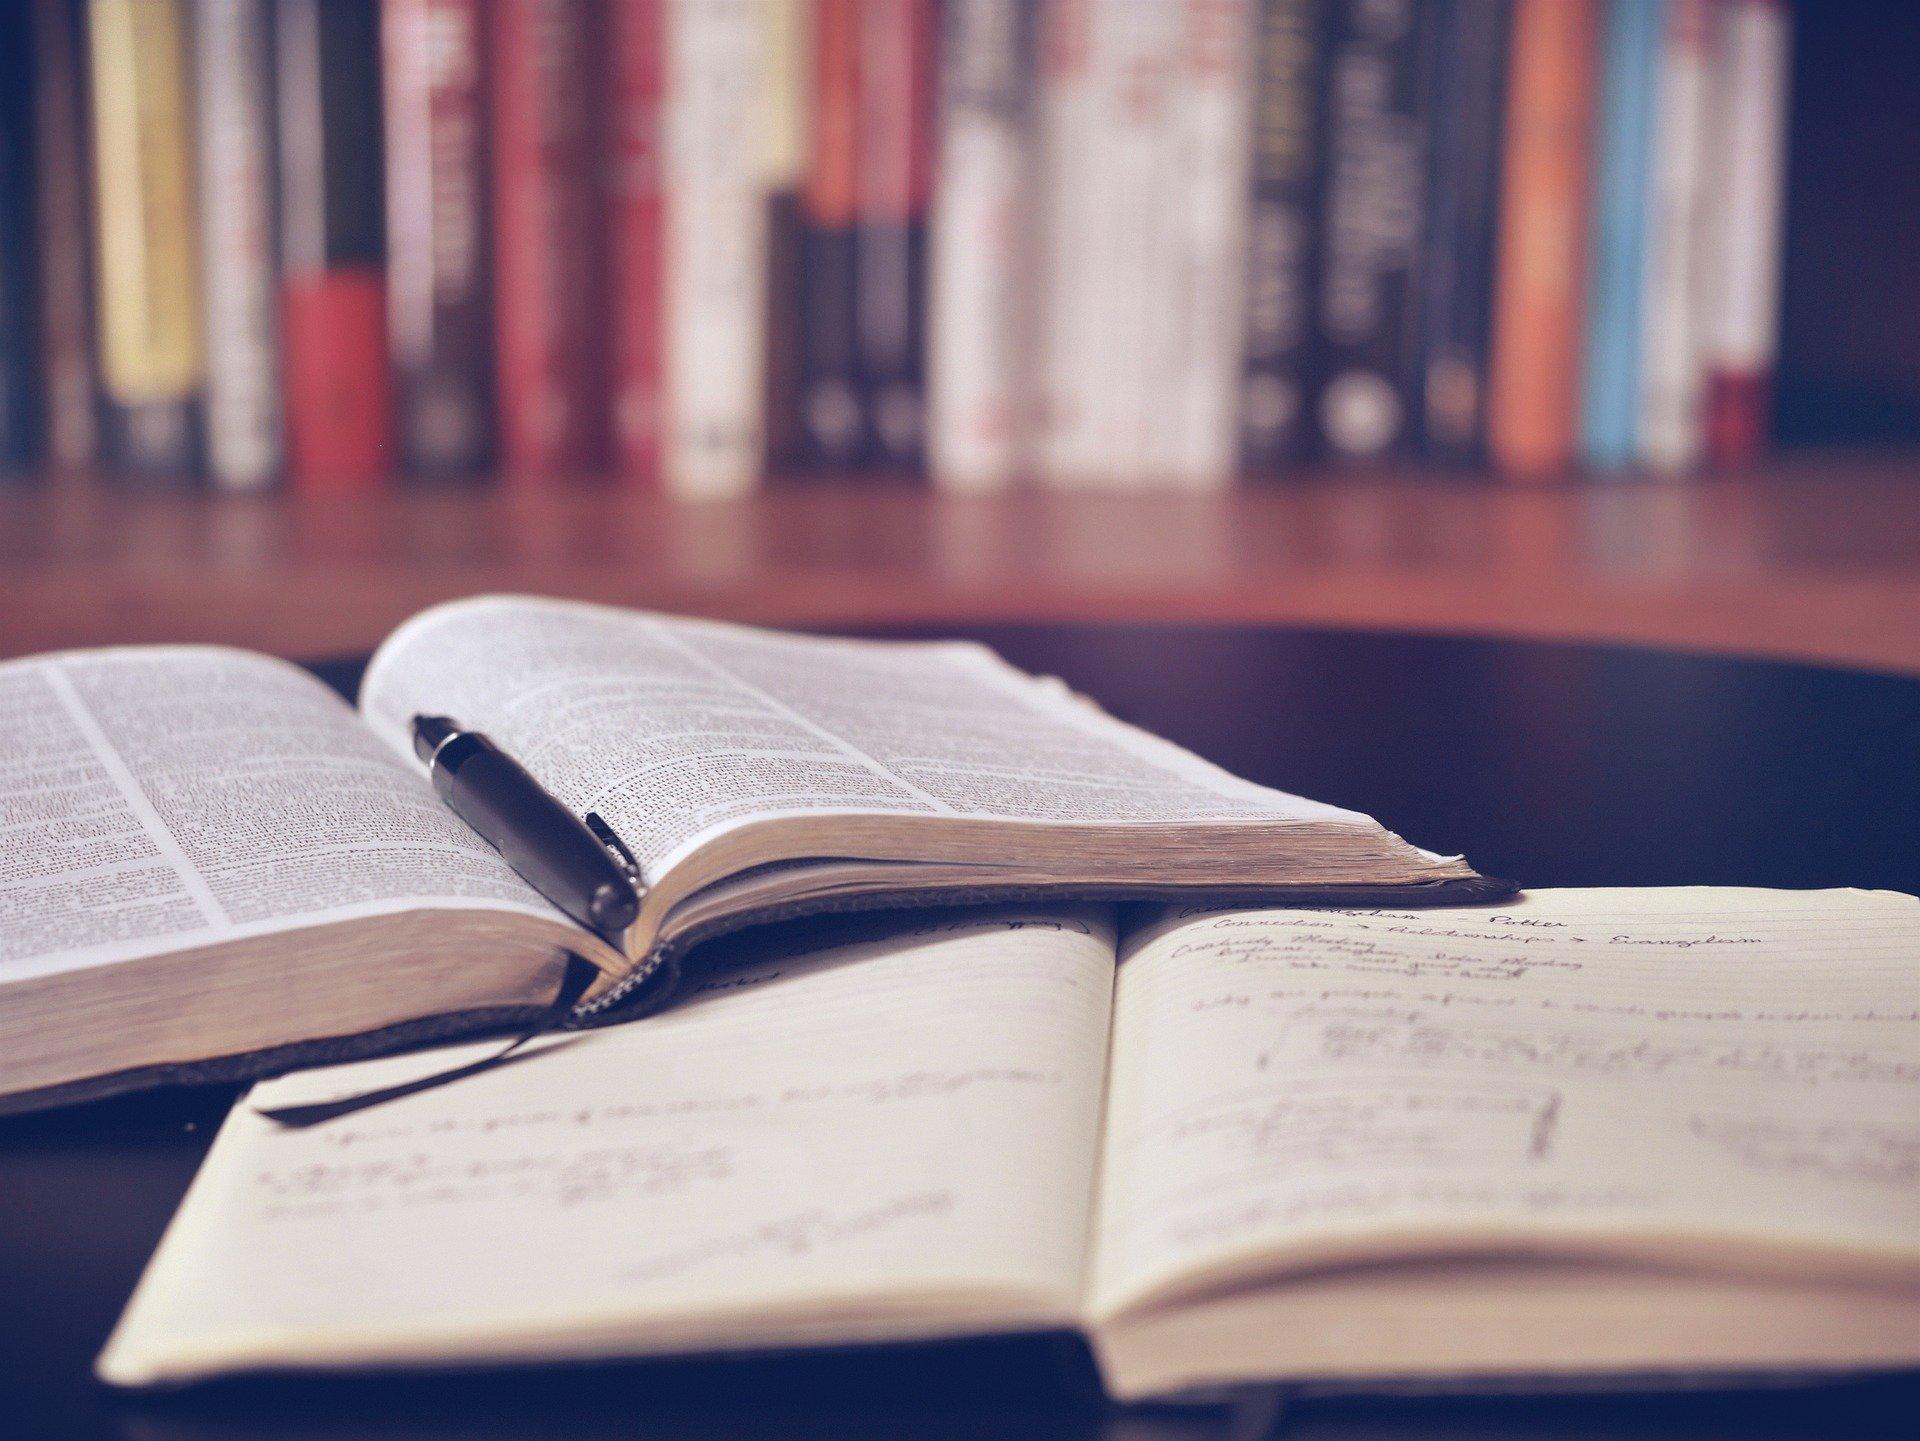 books open on a desk